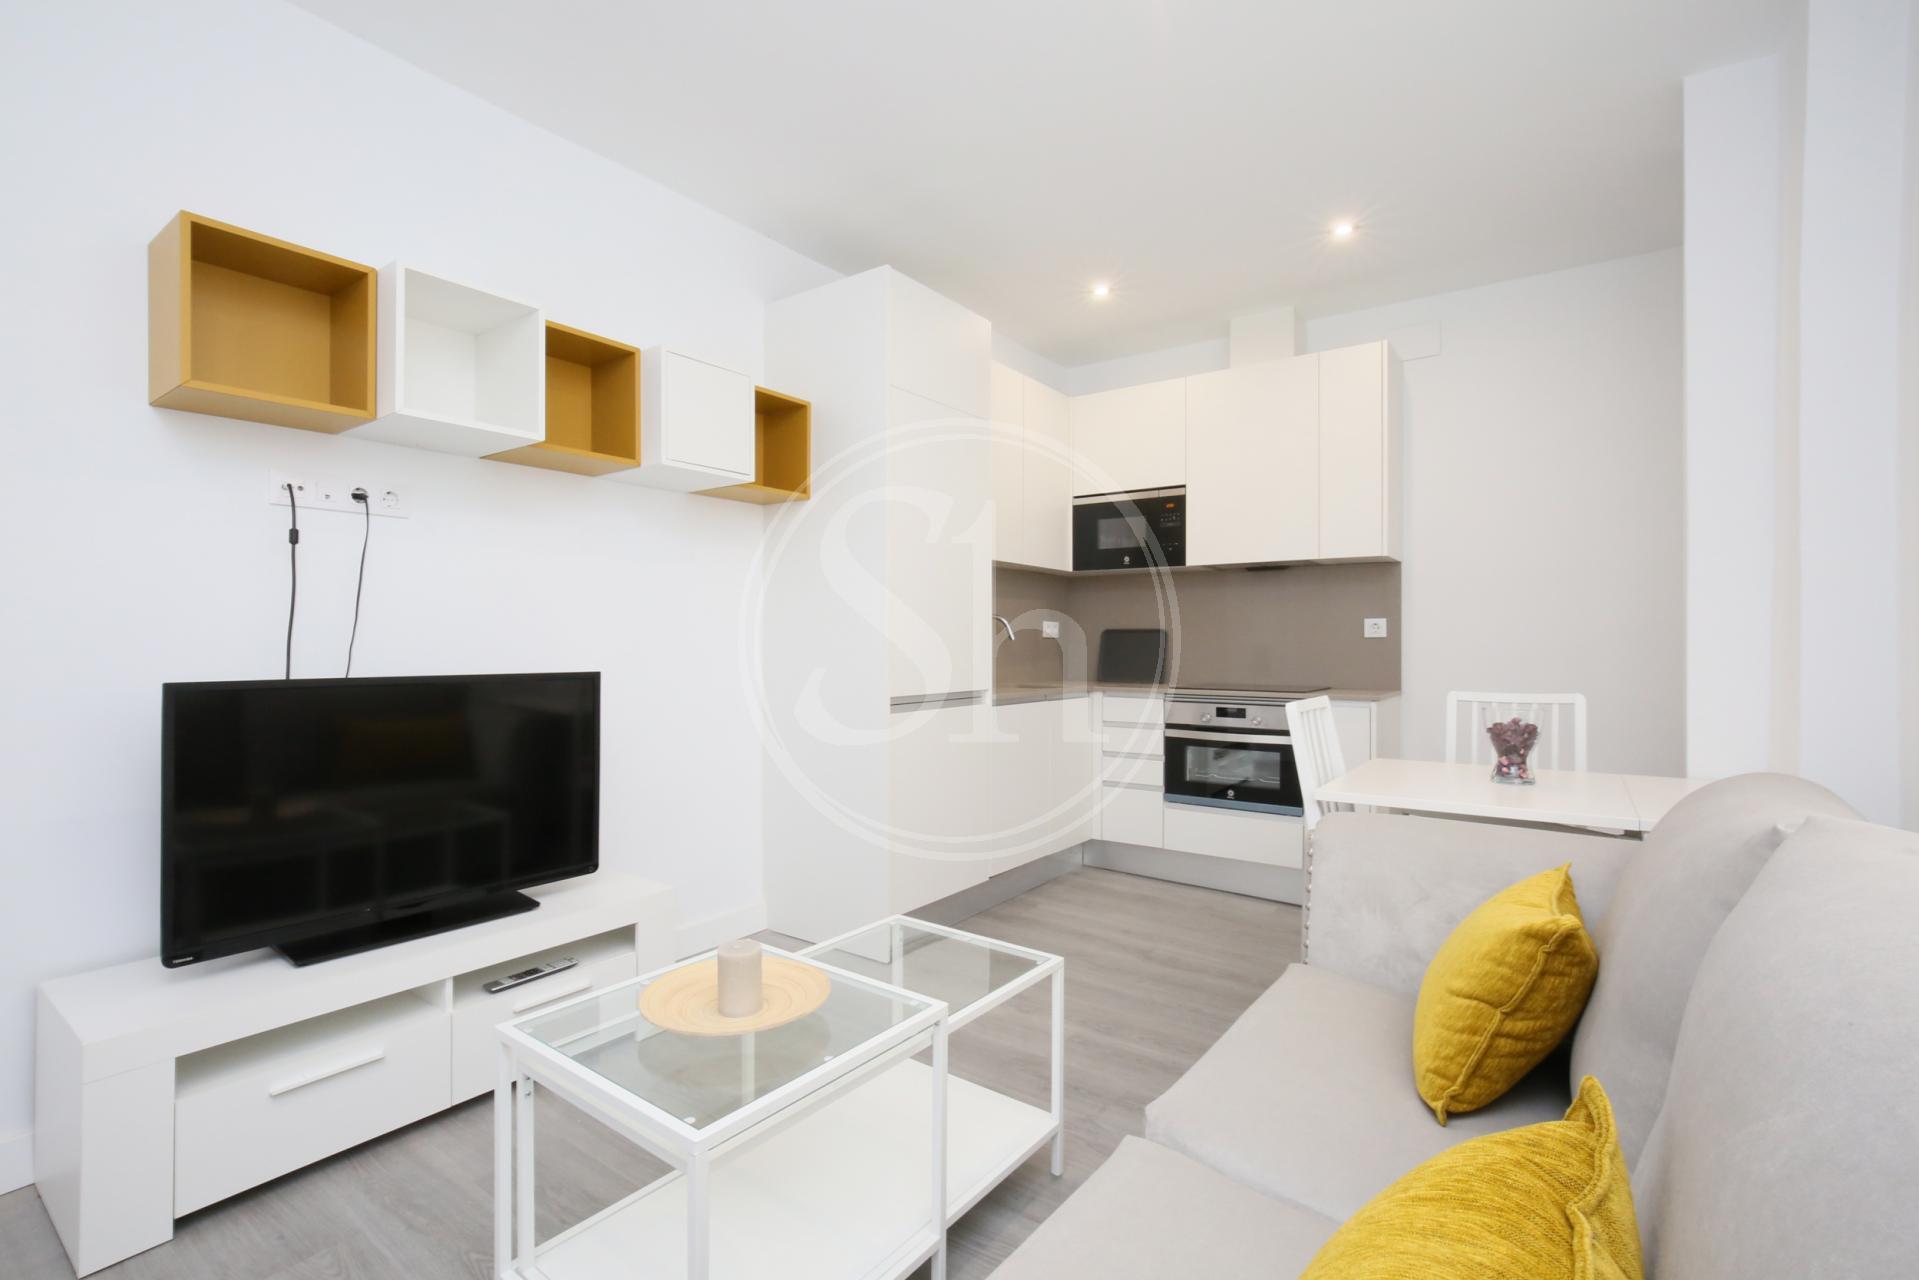 Apartment for Rent in Madrid Joaquín María López - Chamberí